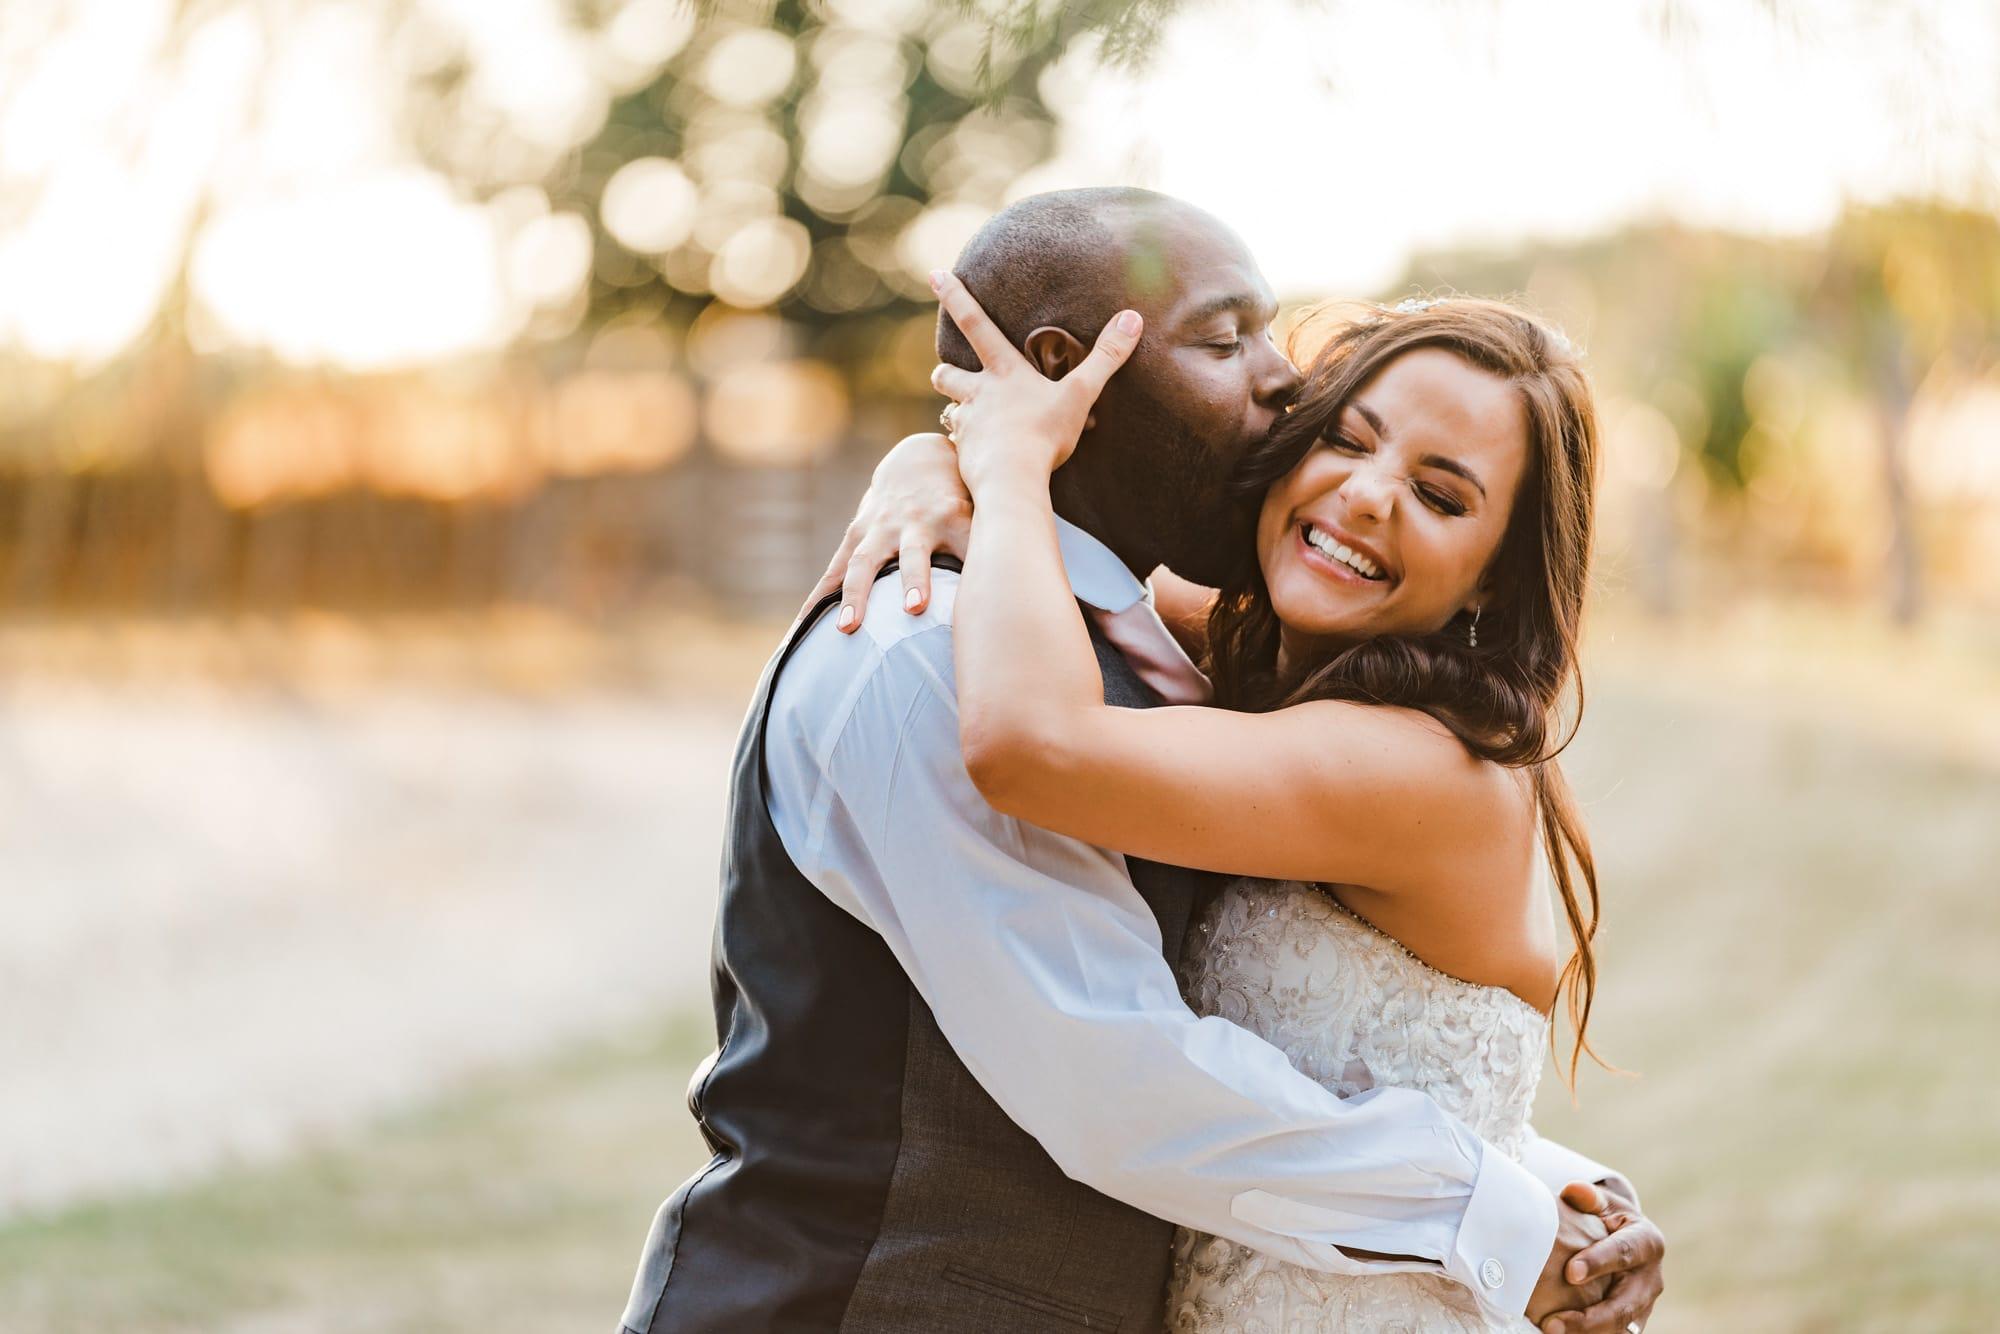 Bride laughing as groom kisses her